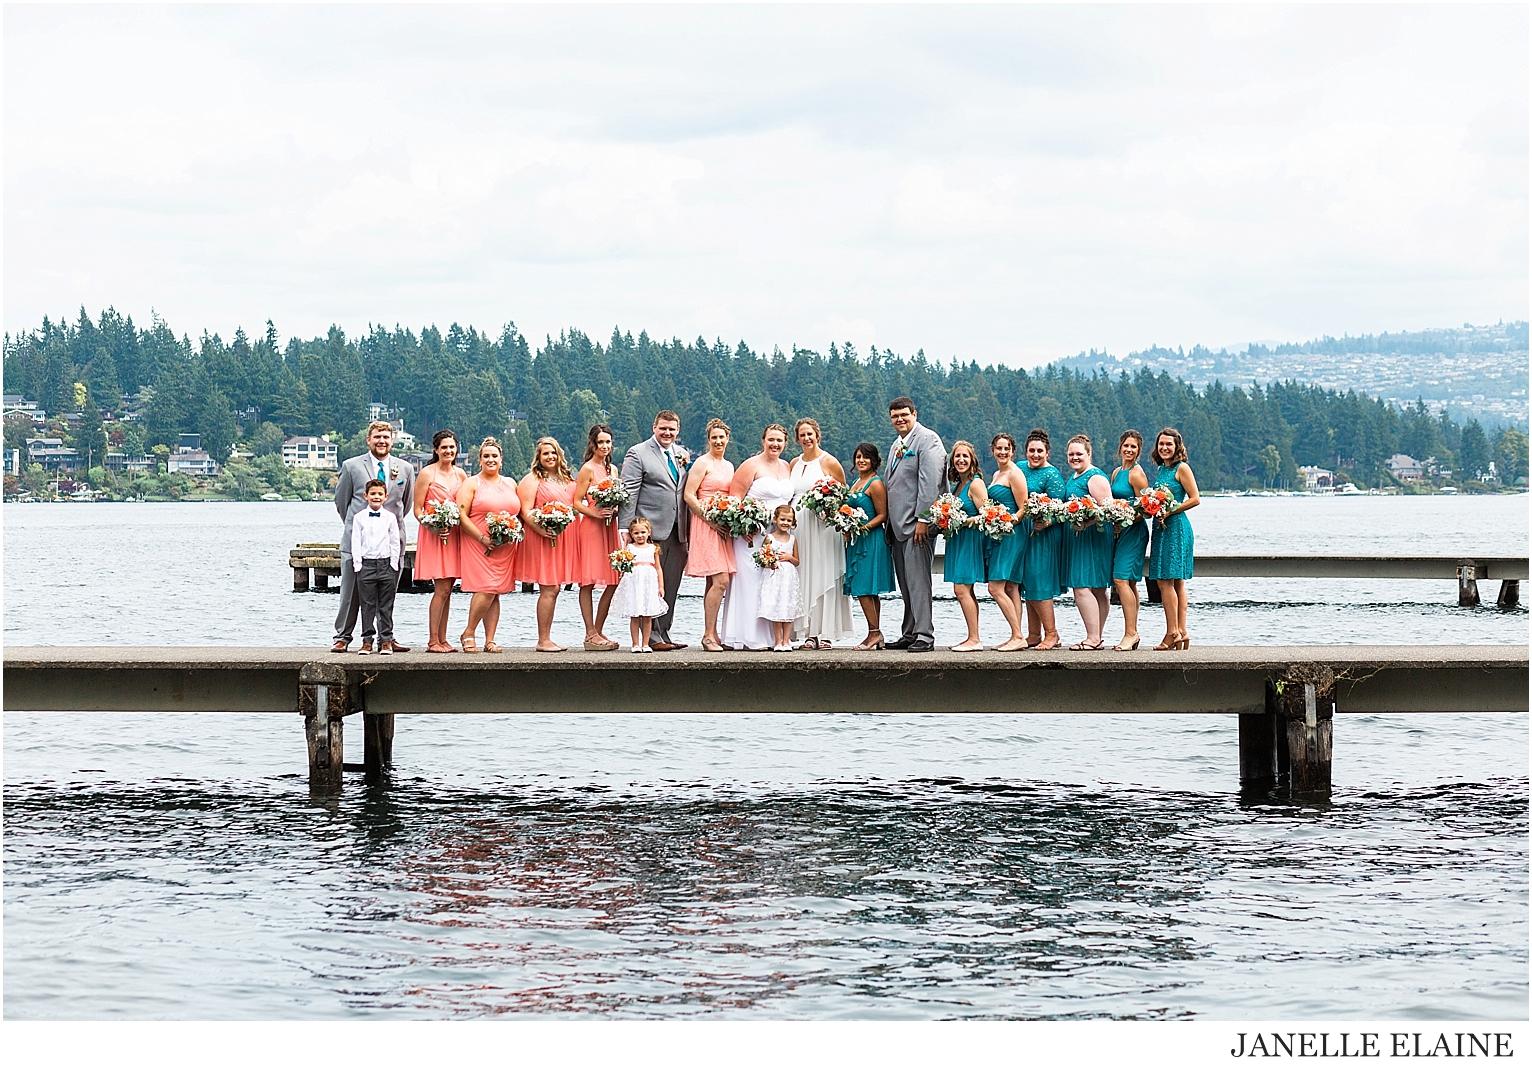 liz and christina lanning-wedding party-luther burbank park-janelle elaine photography-77.jpg